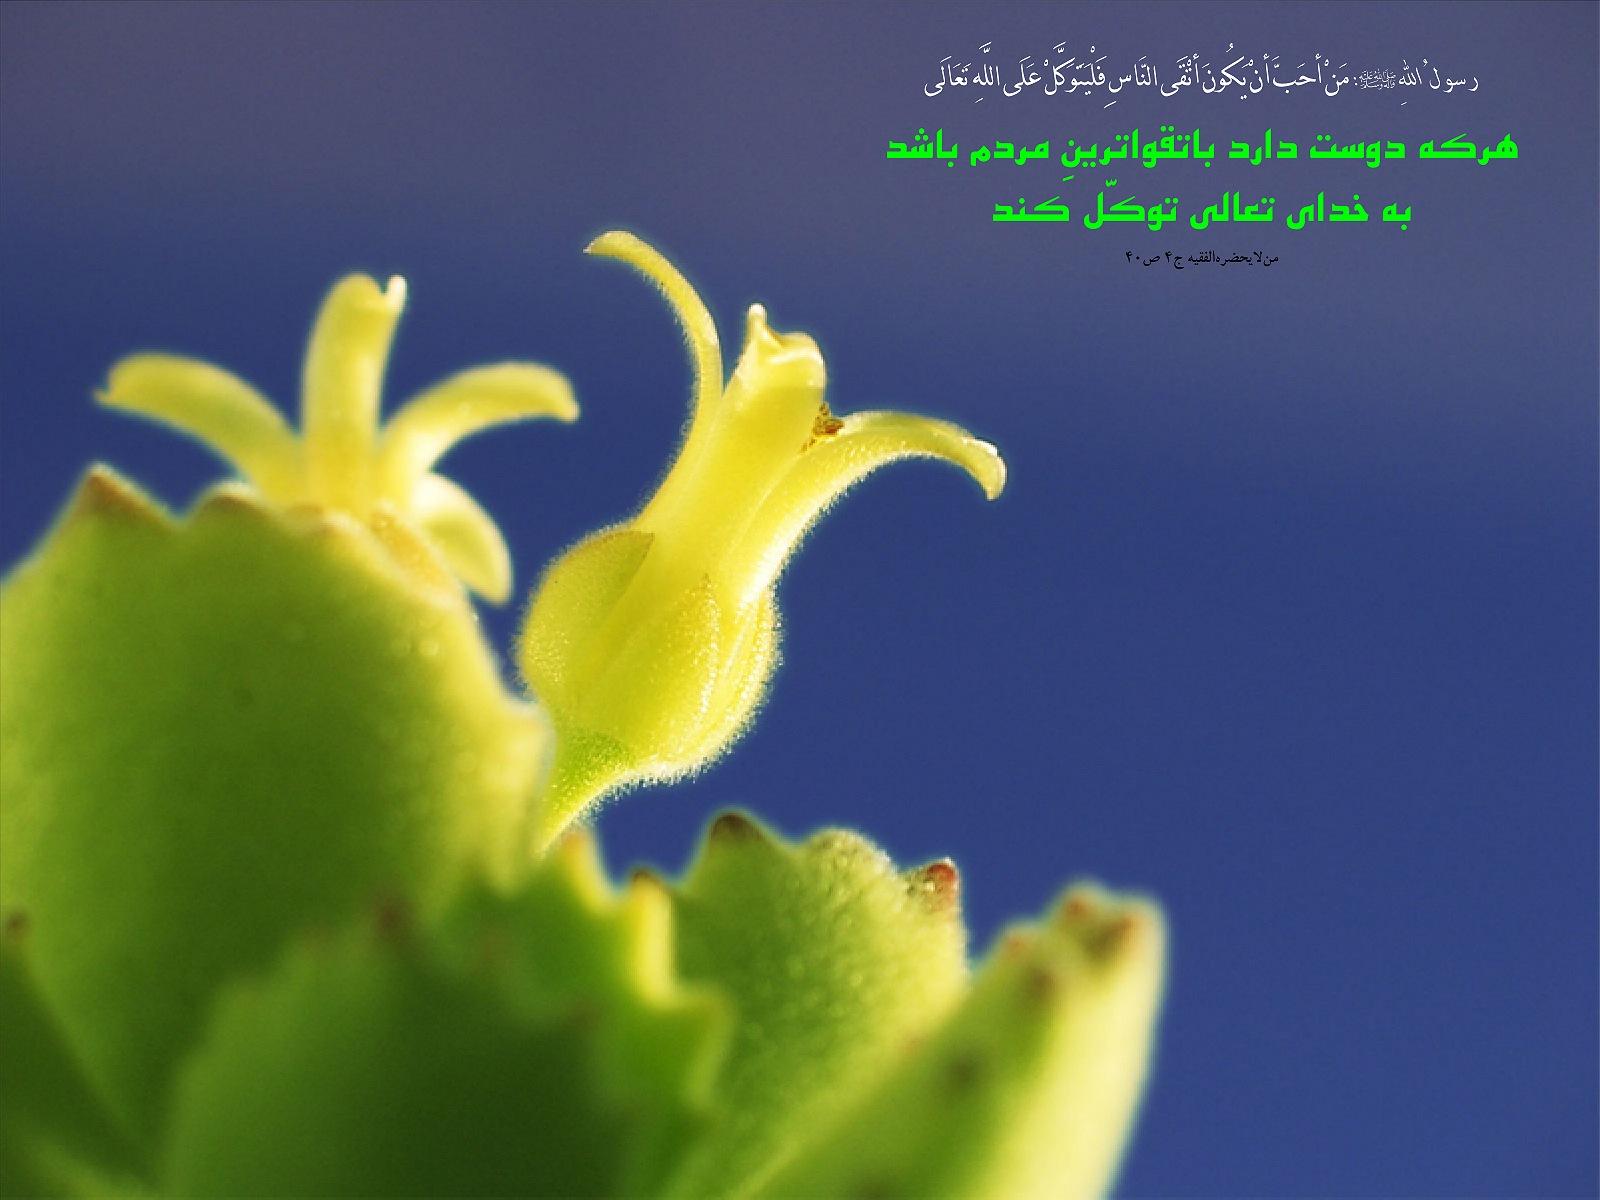 http://mhkh1972.gohardasht.com/uploaded/_81A5BABD-8FEF-46A7-80B9-89685F477754_.jpg